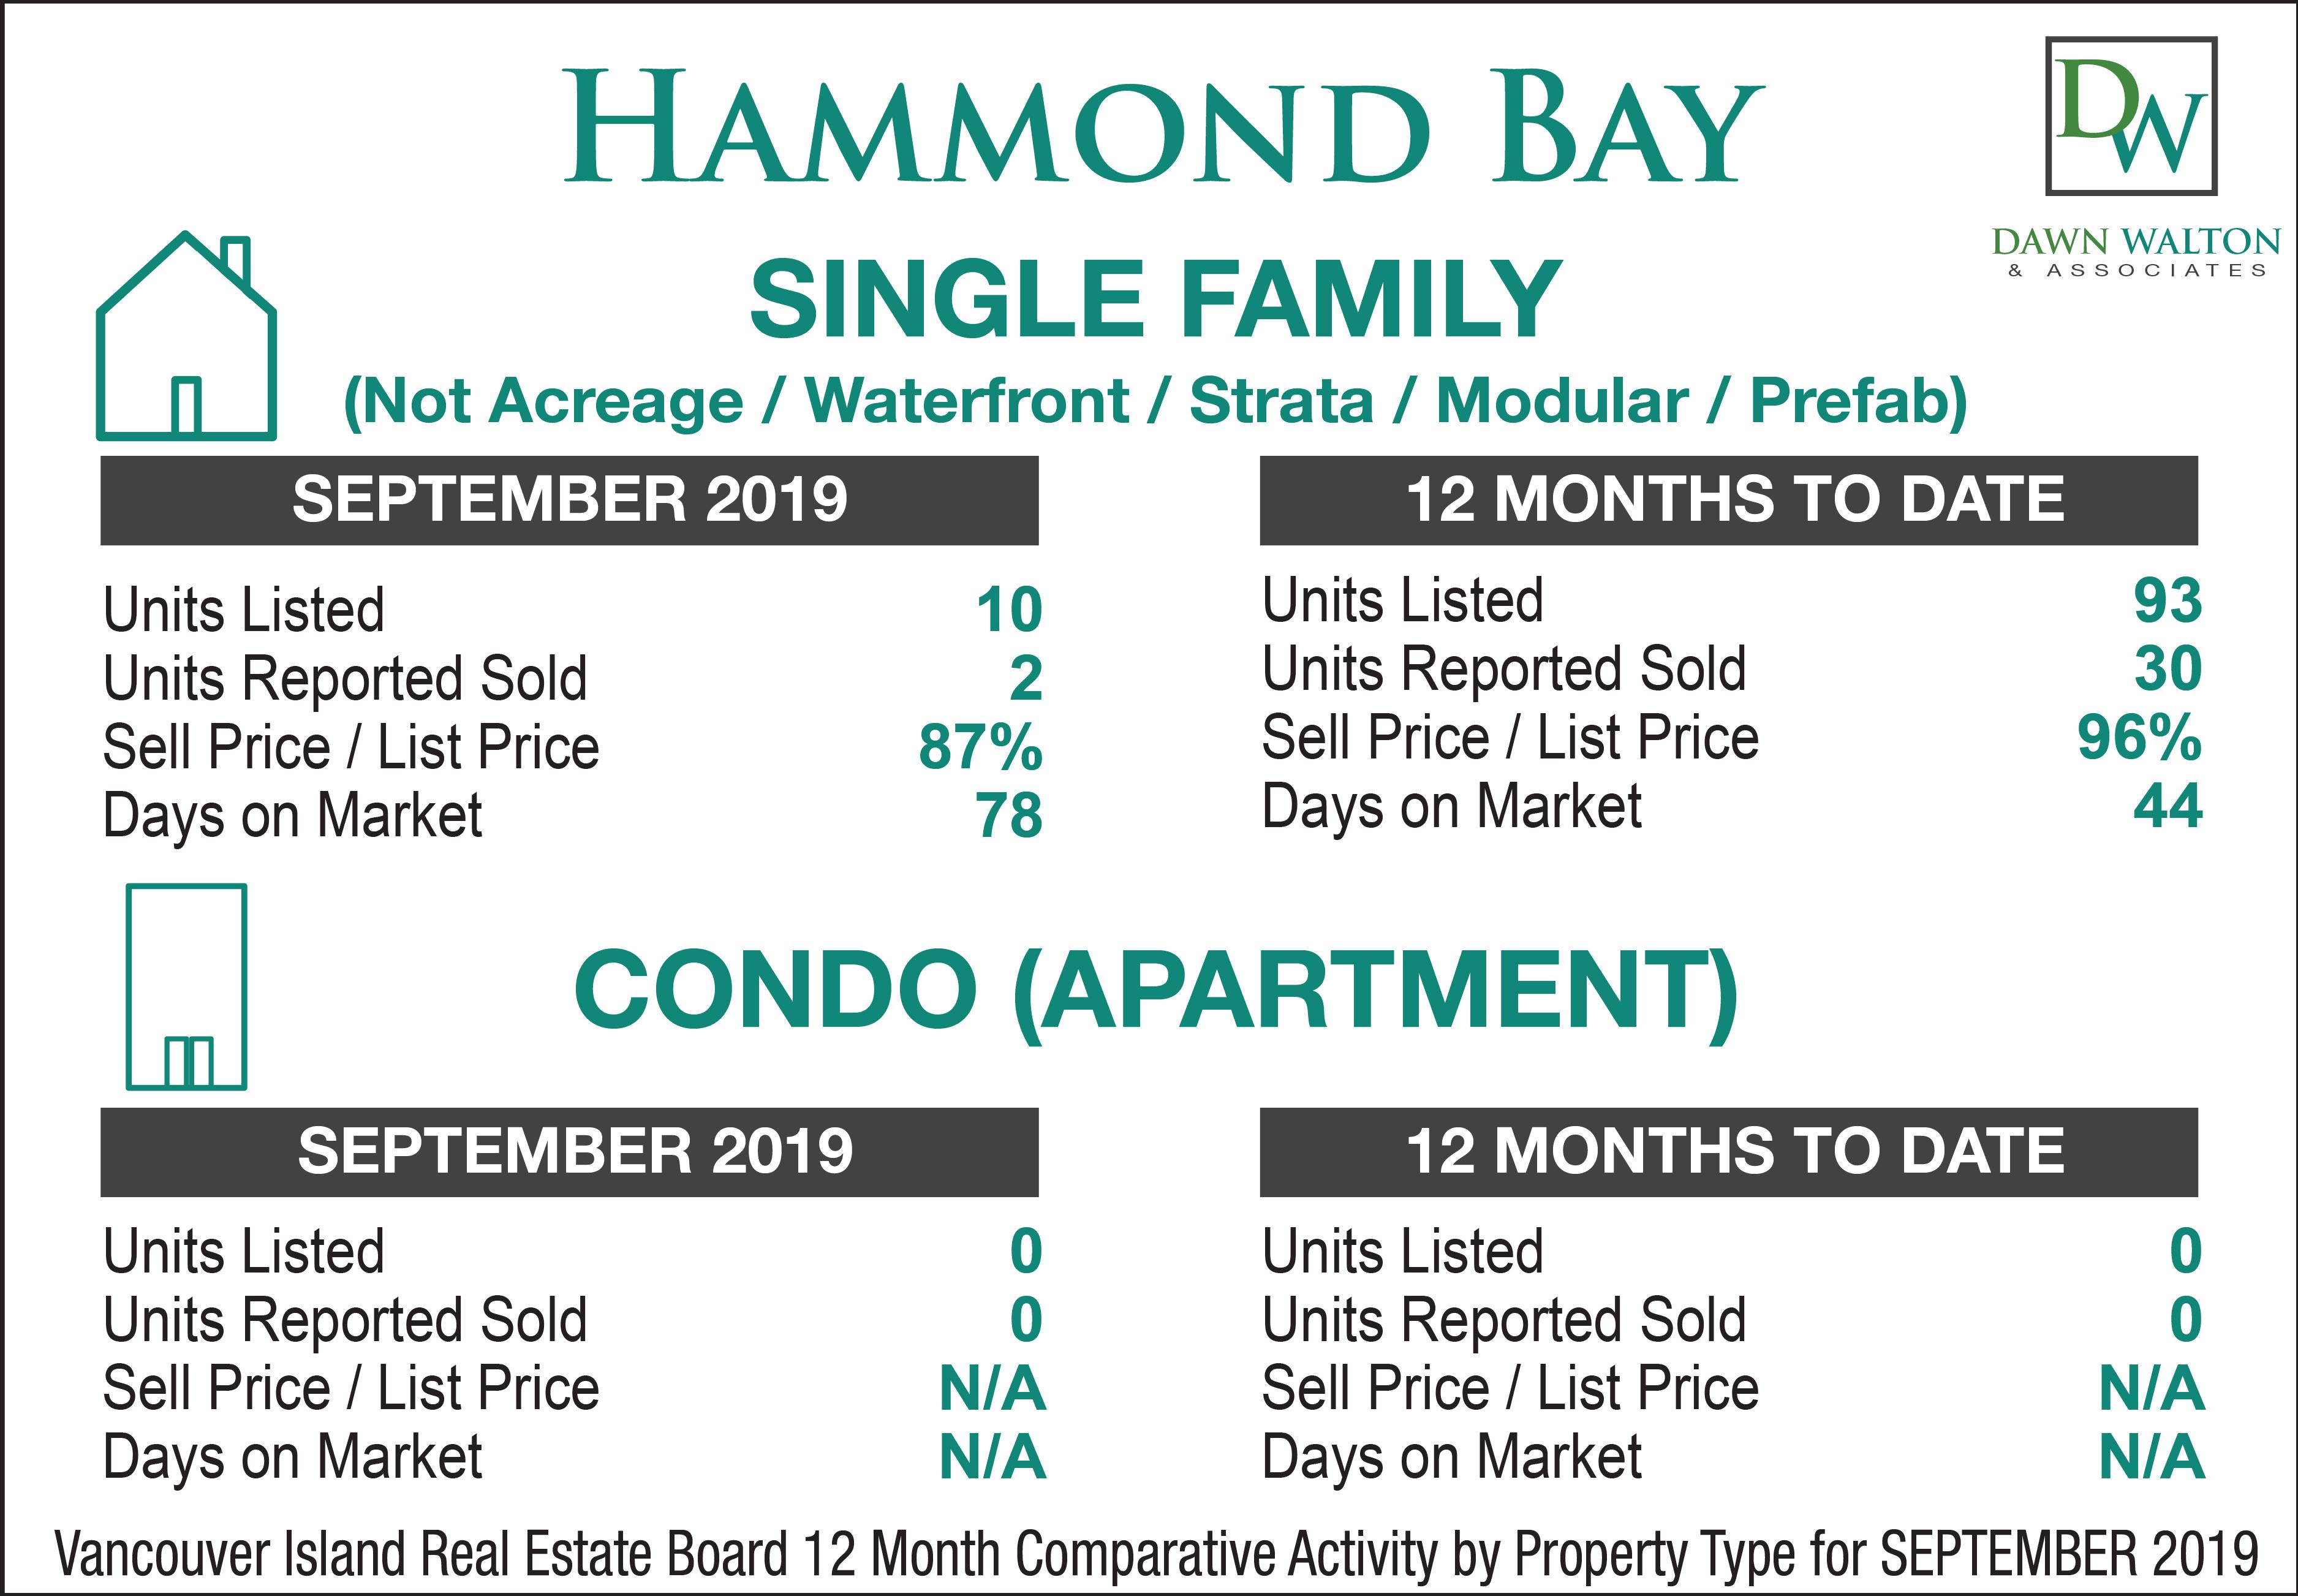 Hammond Bay Real Estate Market Stats September 2019 - Nanaimo Realtor Dawn Walton